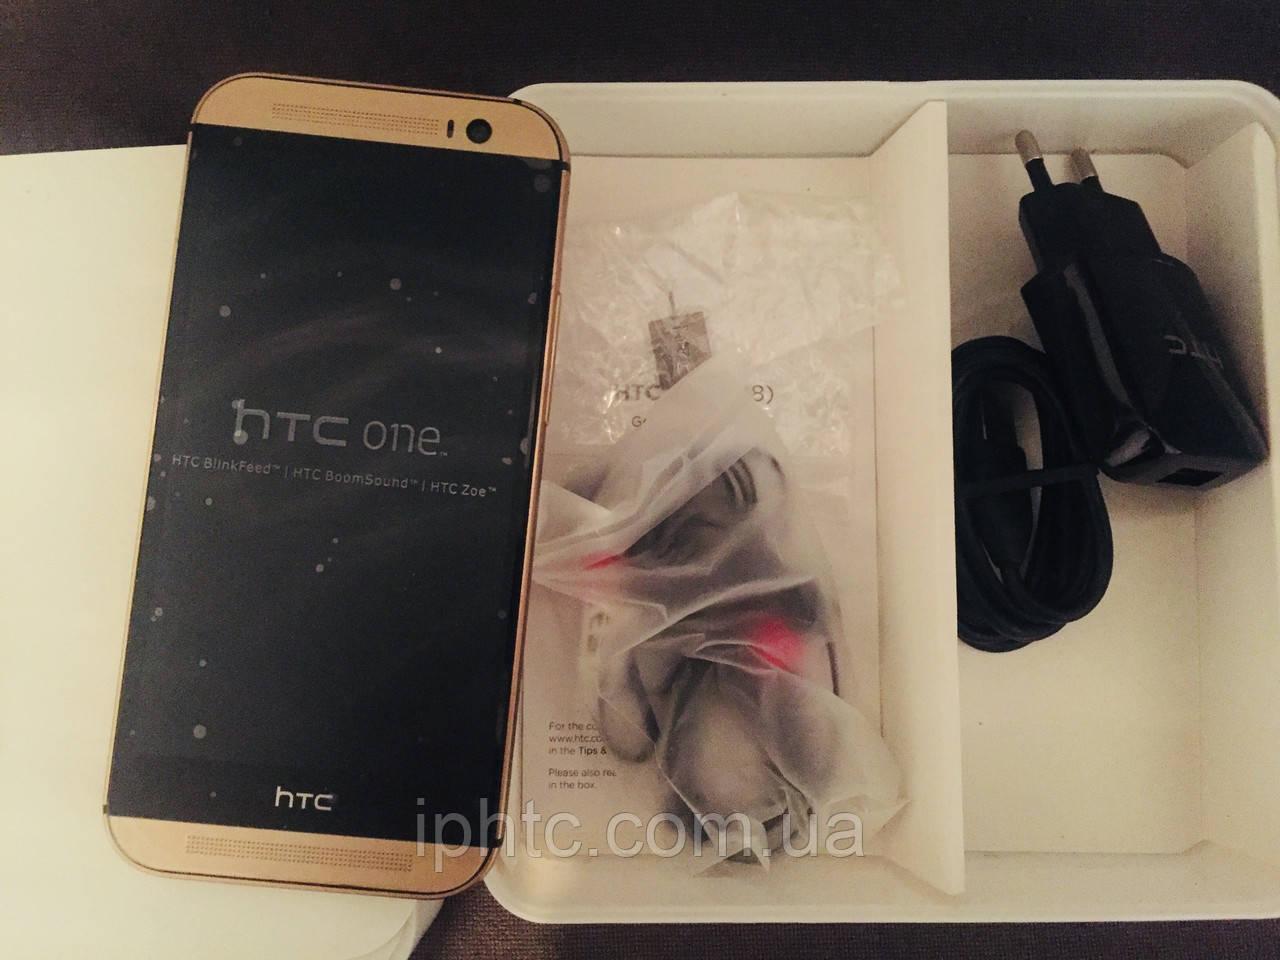 HTC One M8 16GB Gold.4G EU. Новый. В наличии.